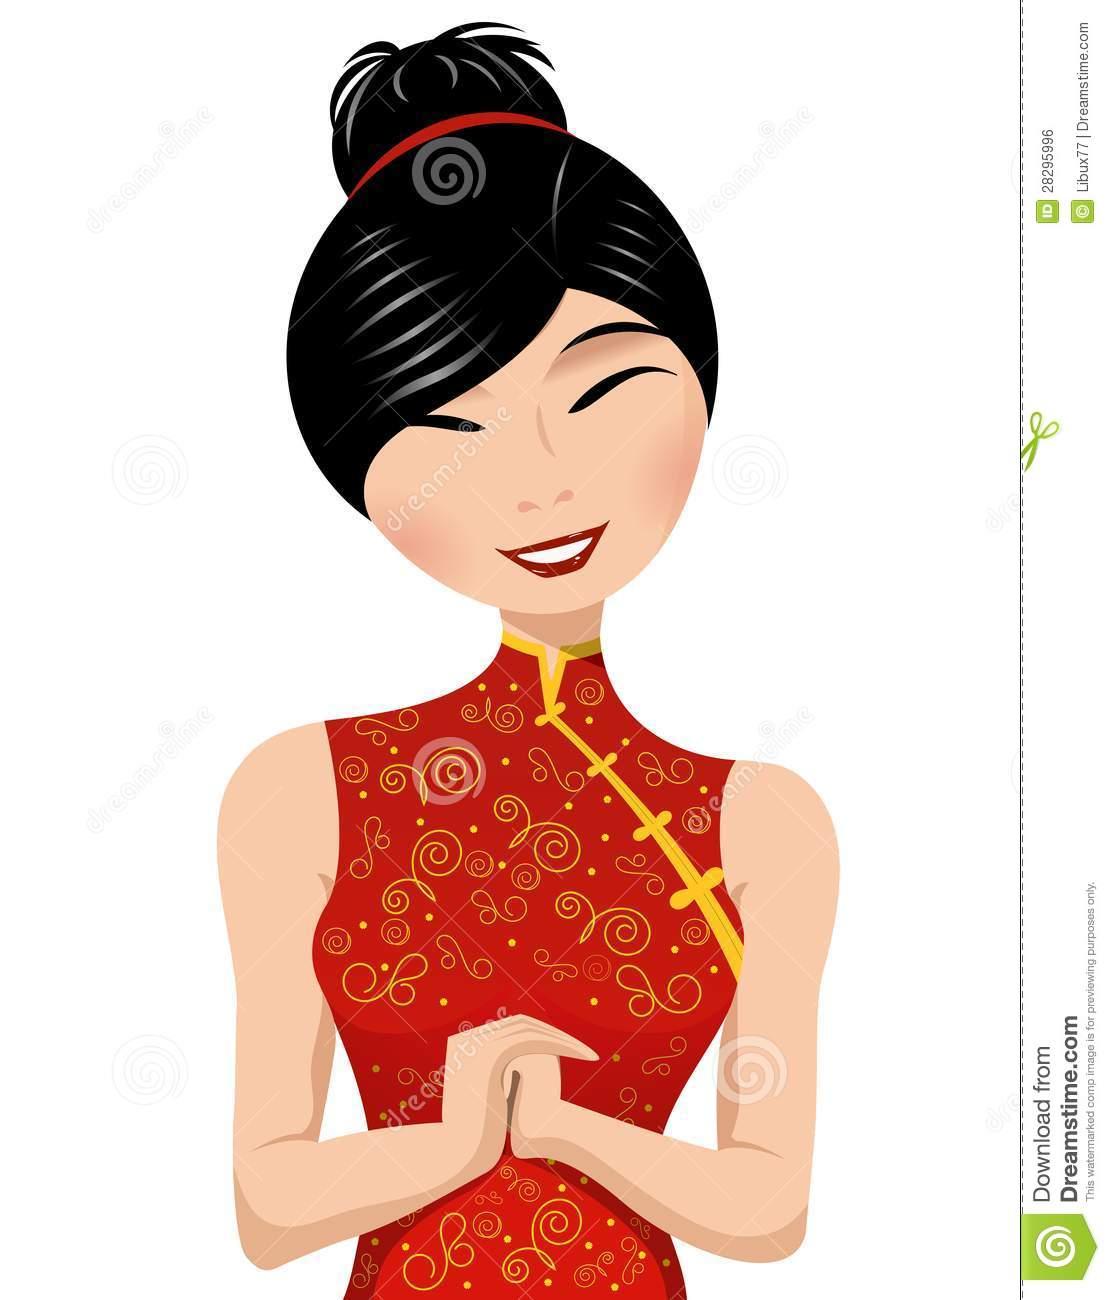 China clipart lady chinese, China lady chinese Transparent.